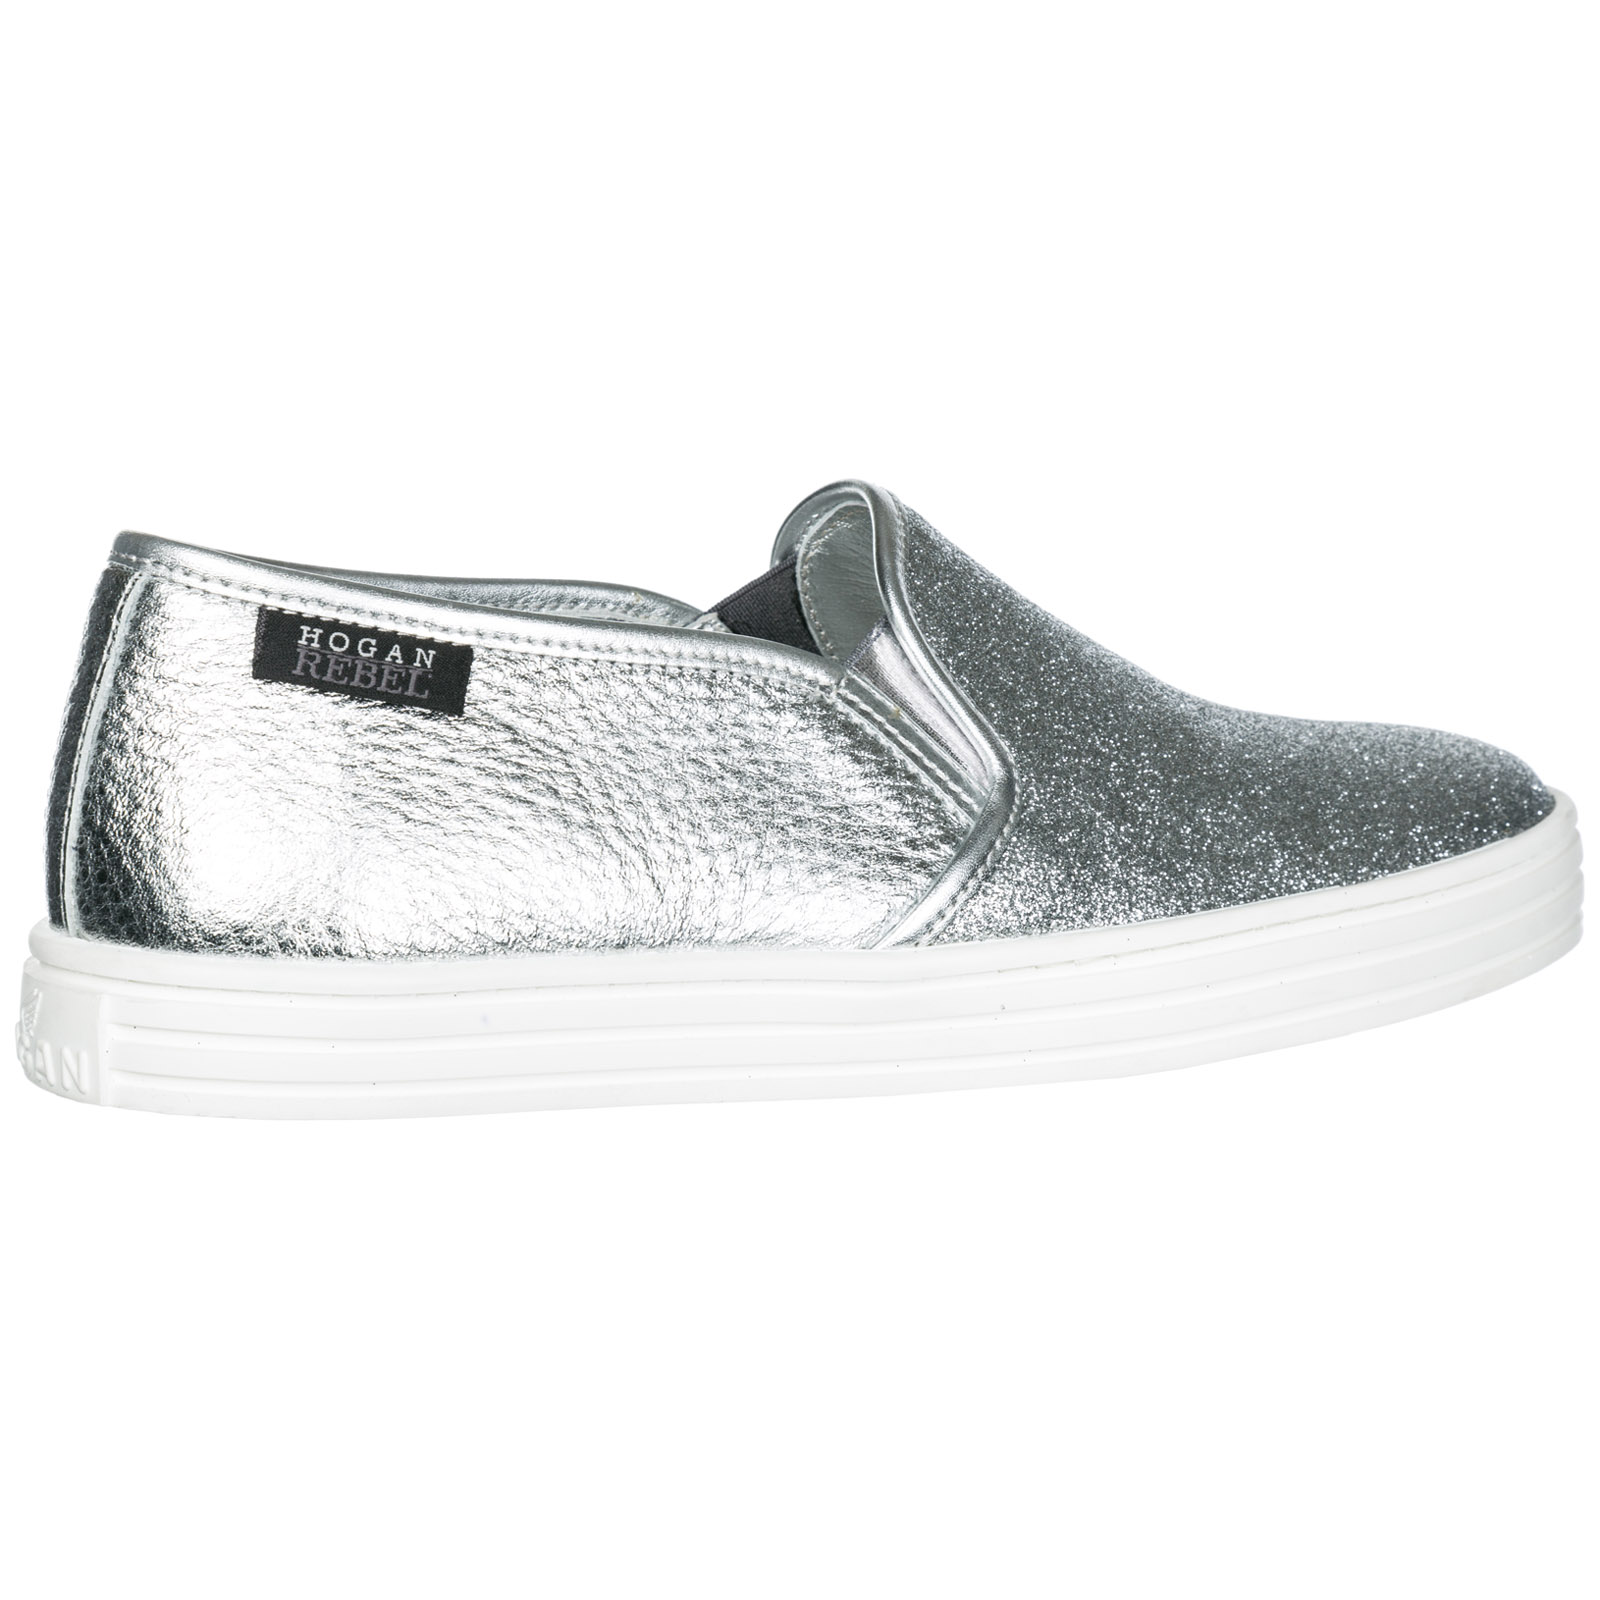 Slip On Shoes Hogan Rebel R141 Hxw Q560gajb200 Argento